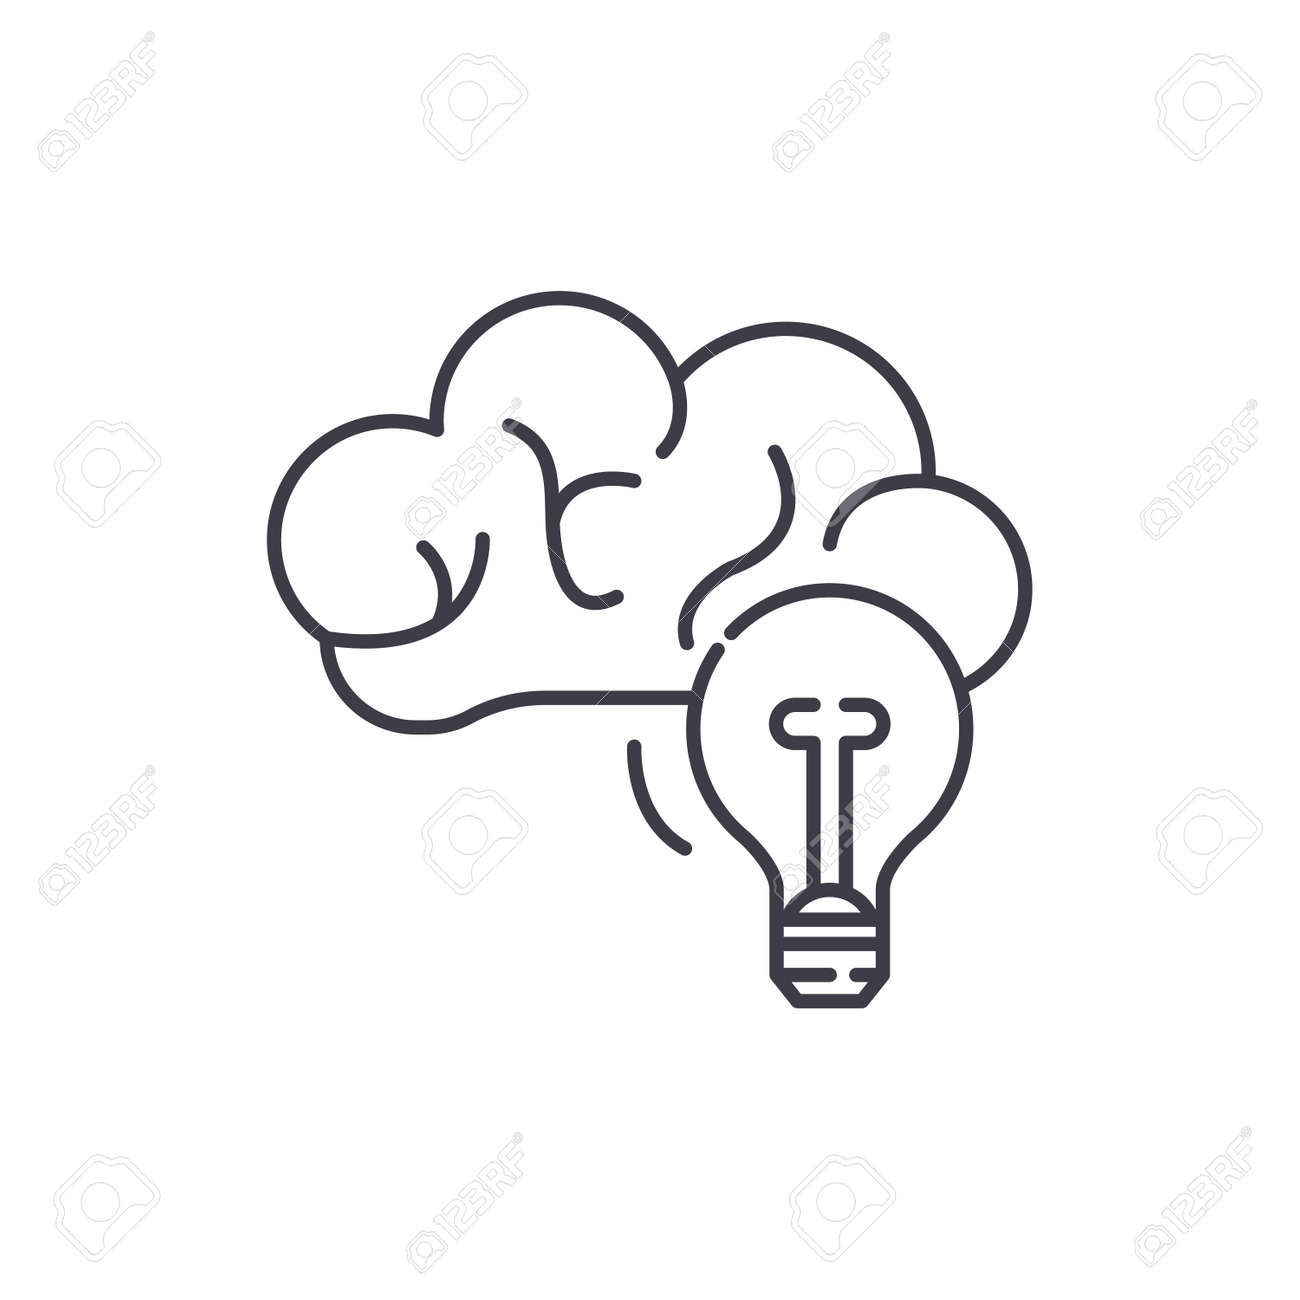 Creative Thinking Clip Art